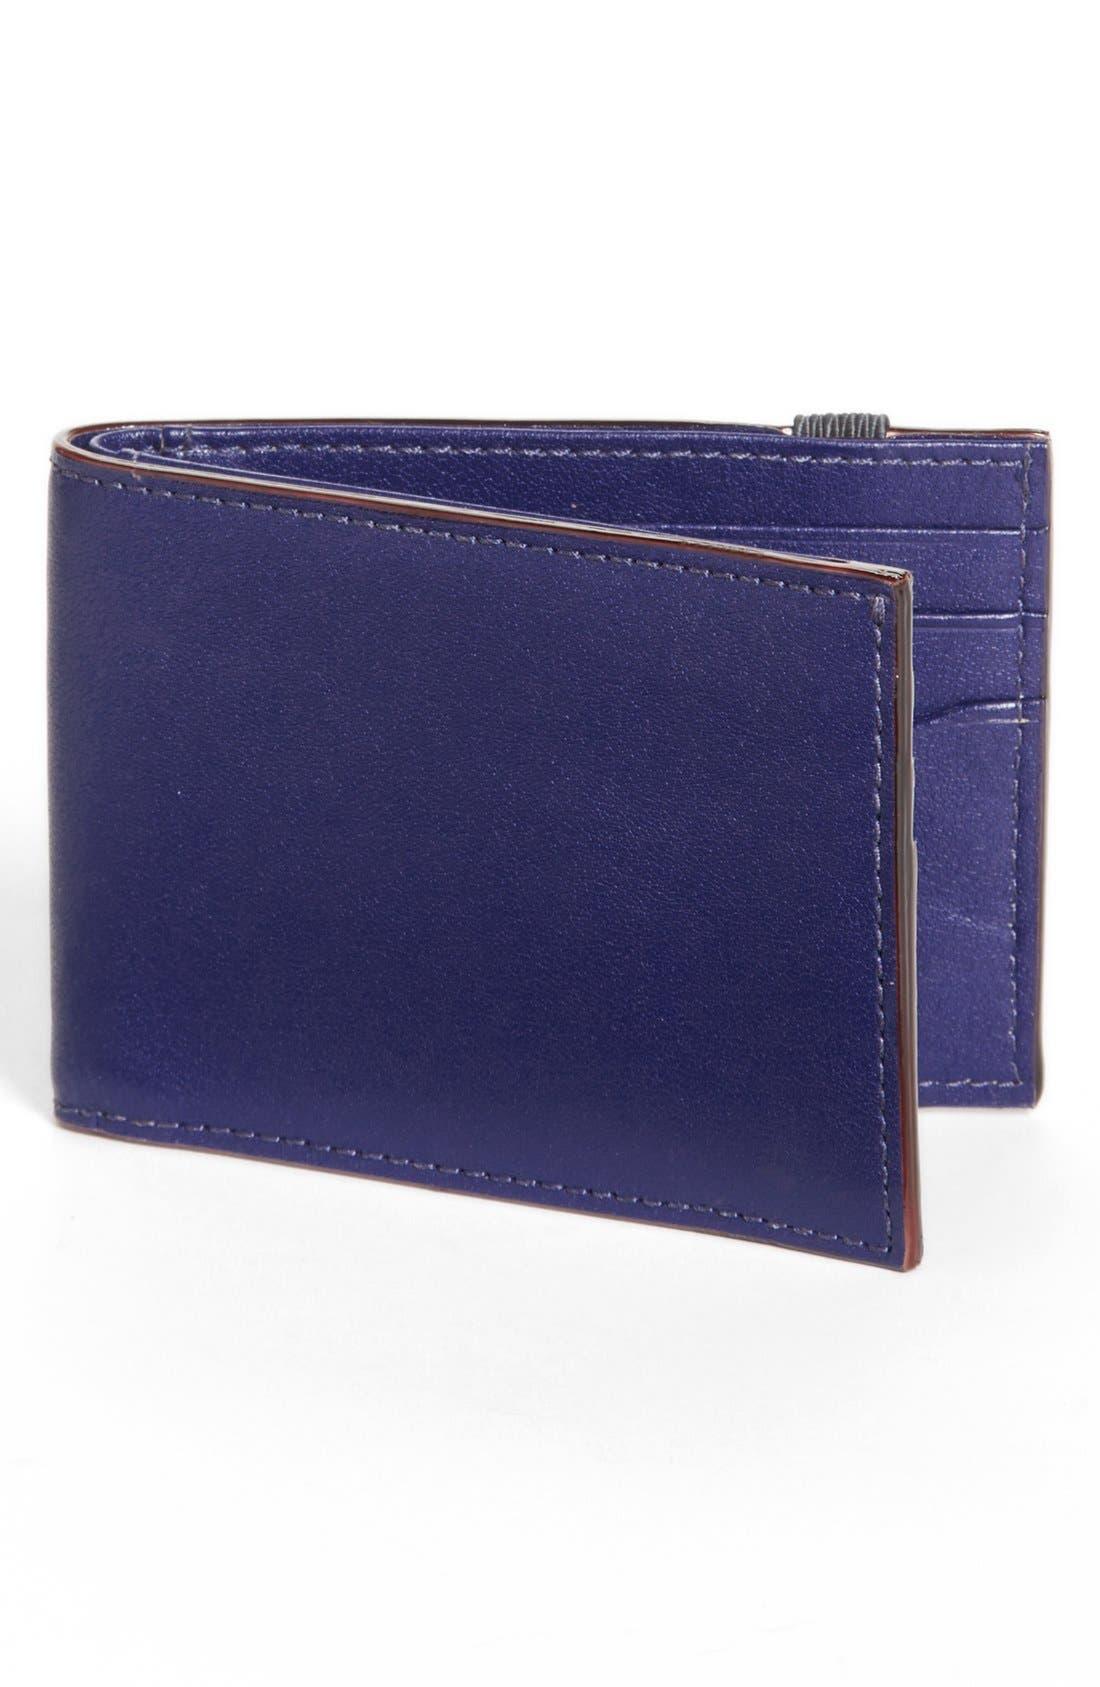 Main Image - Jack Spade Index Wallet